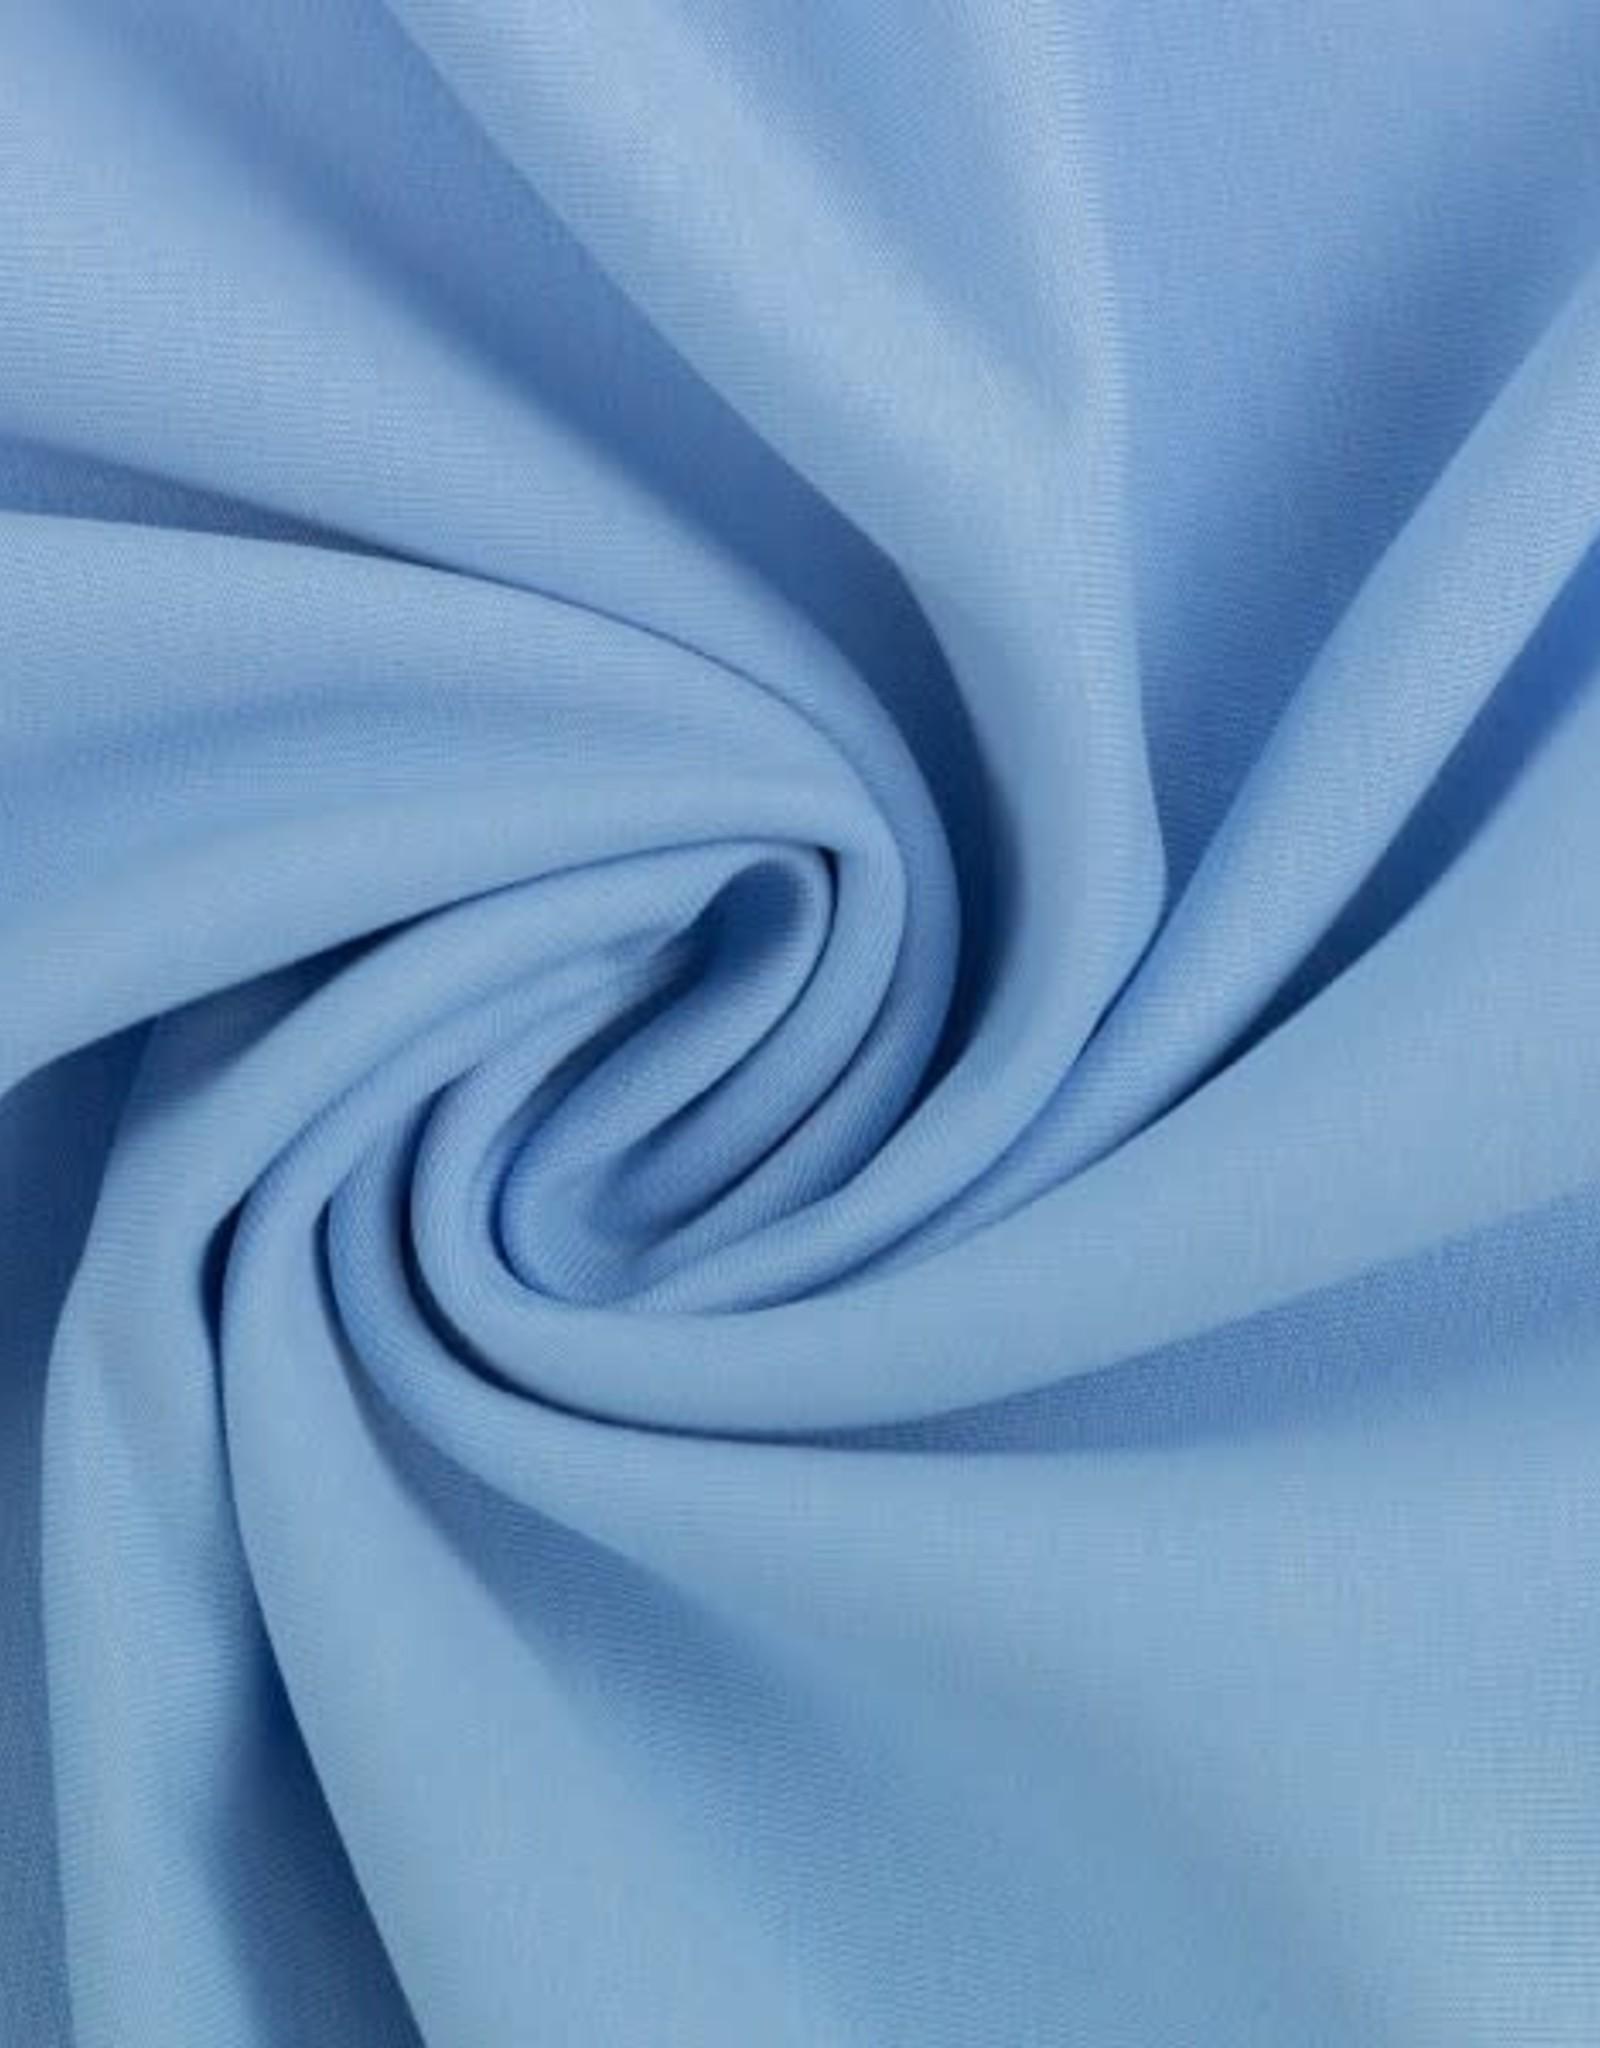 French Terry - Lichtblauw